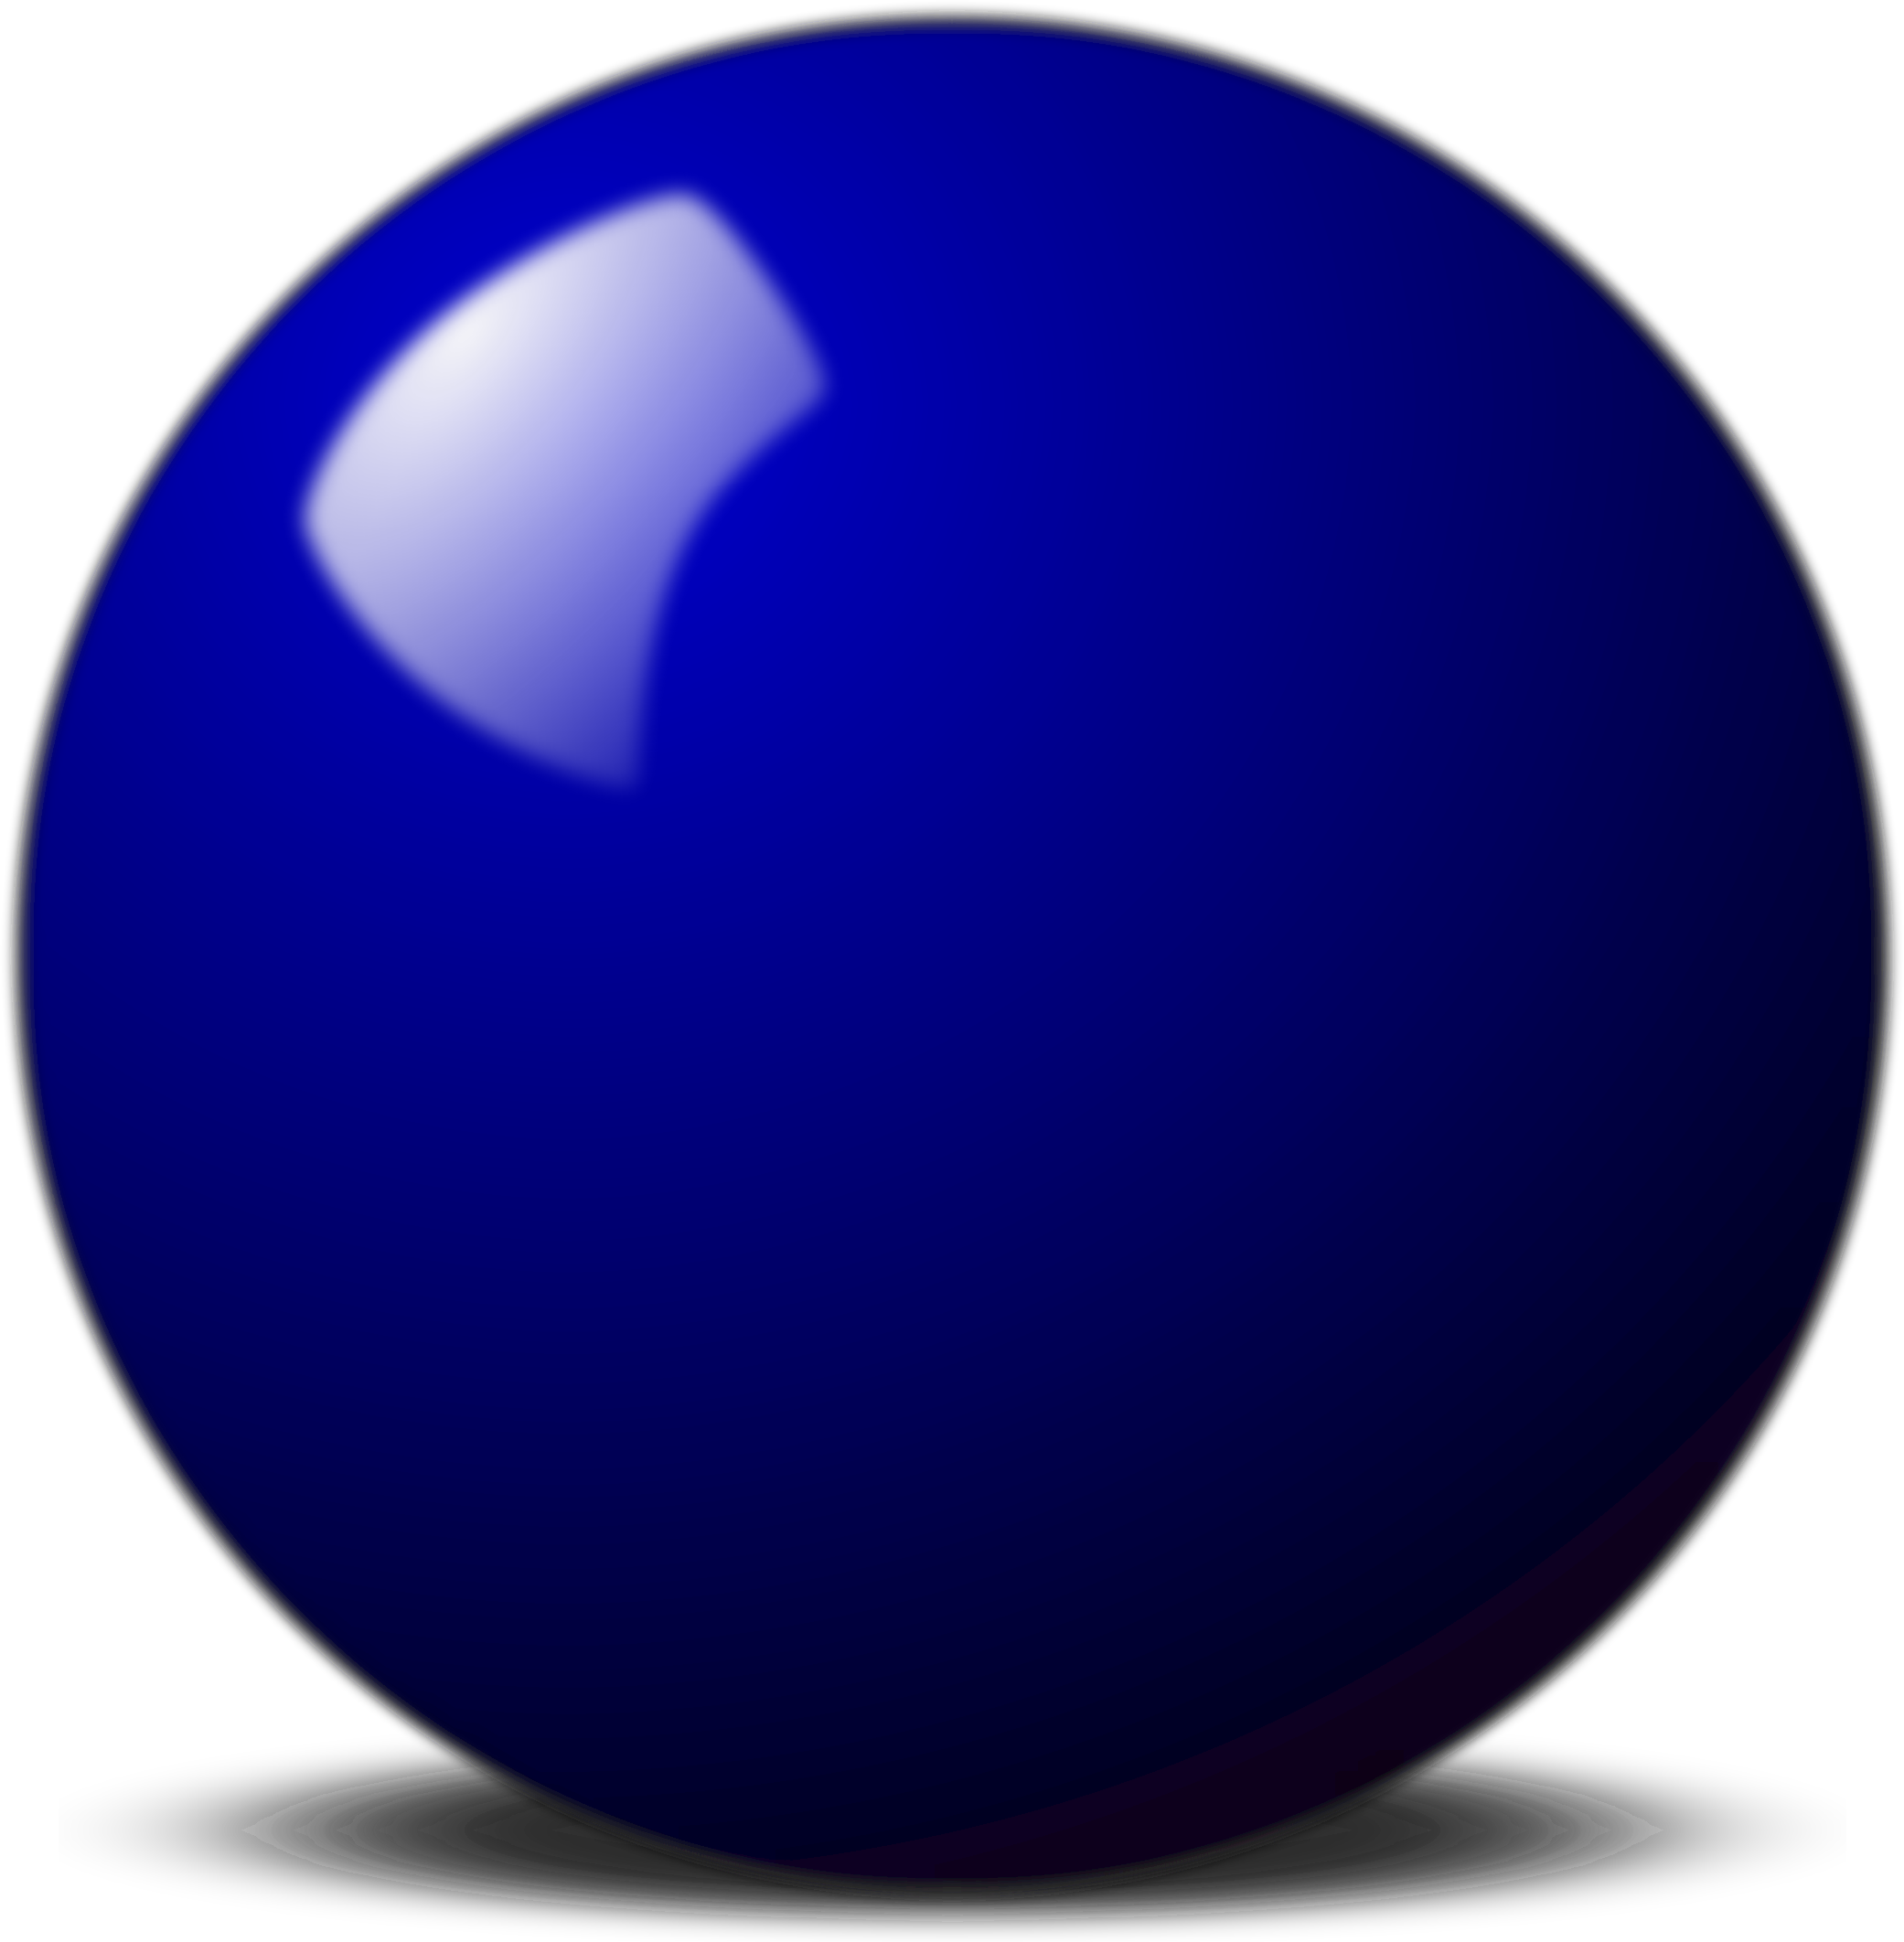 Snooker ball big image. Circle clipart blue